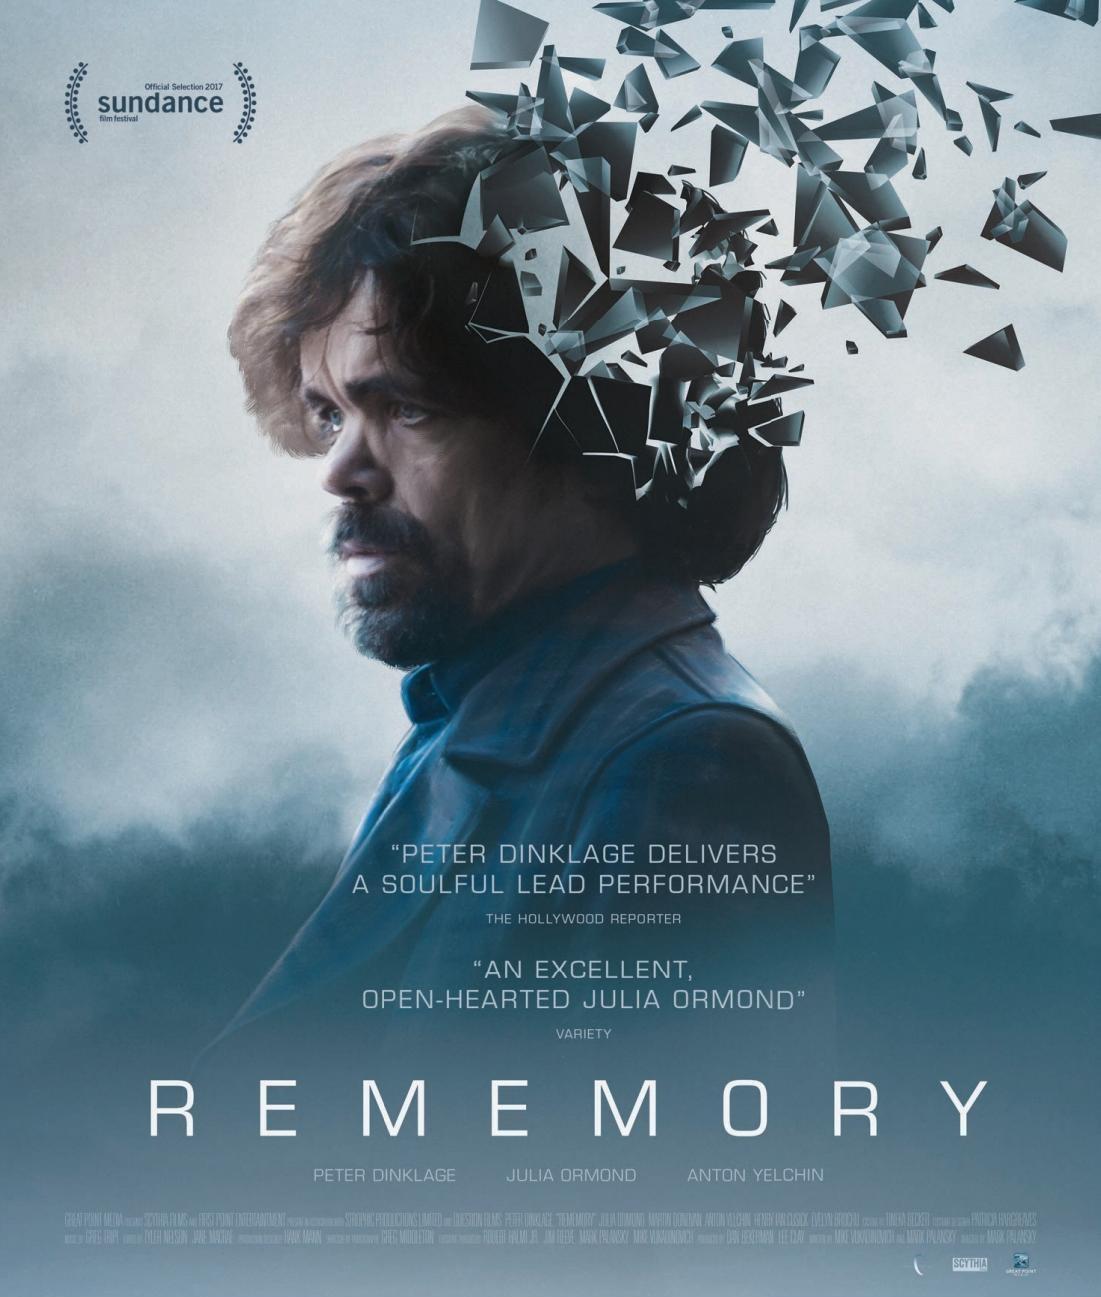 Rememory-Poster-1.jpg?ssl=1